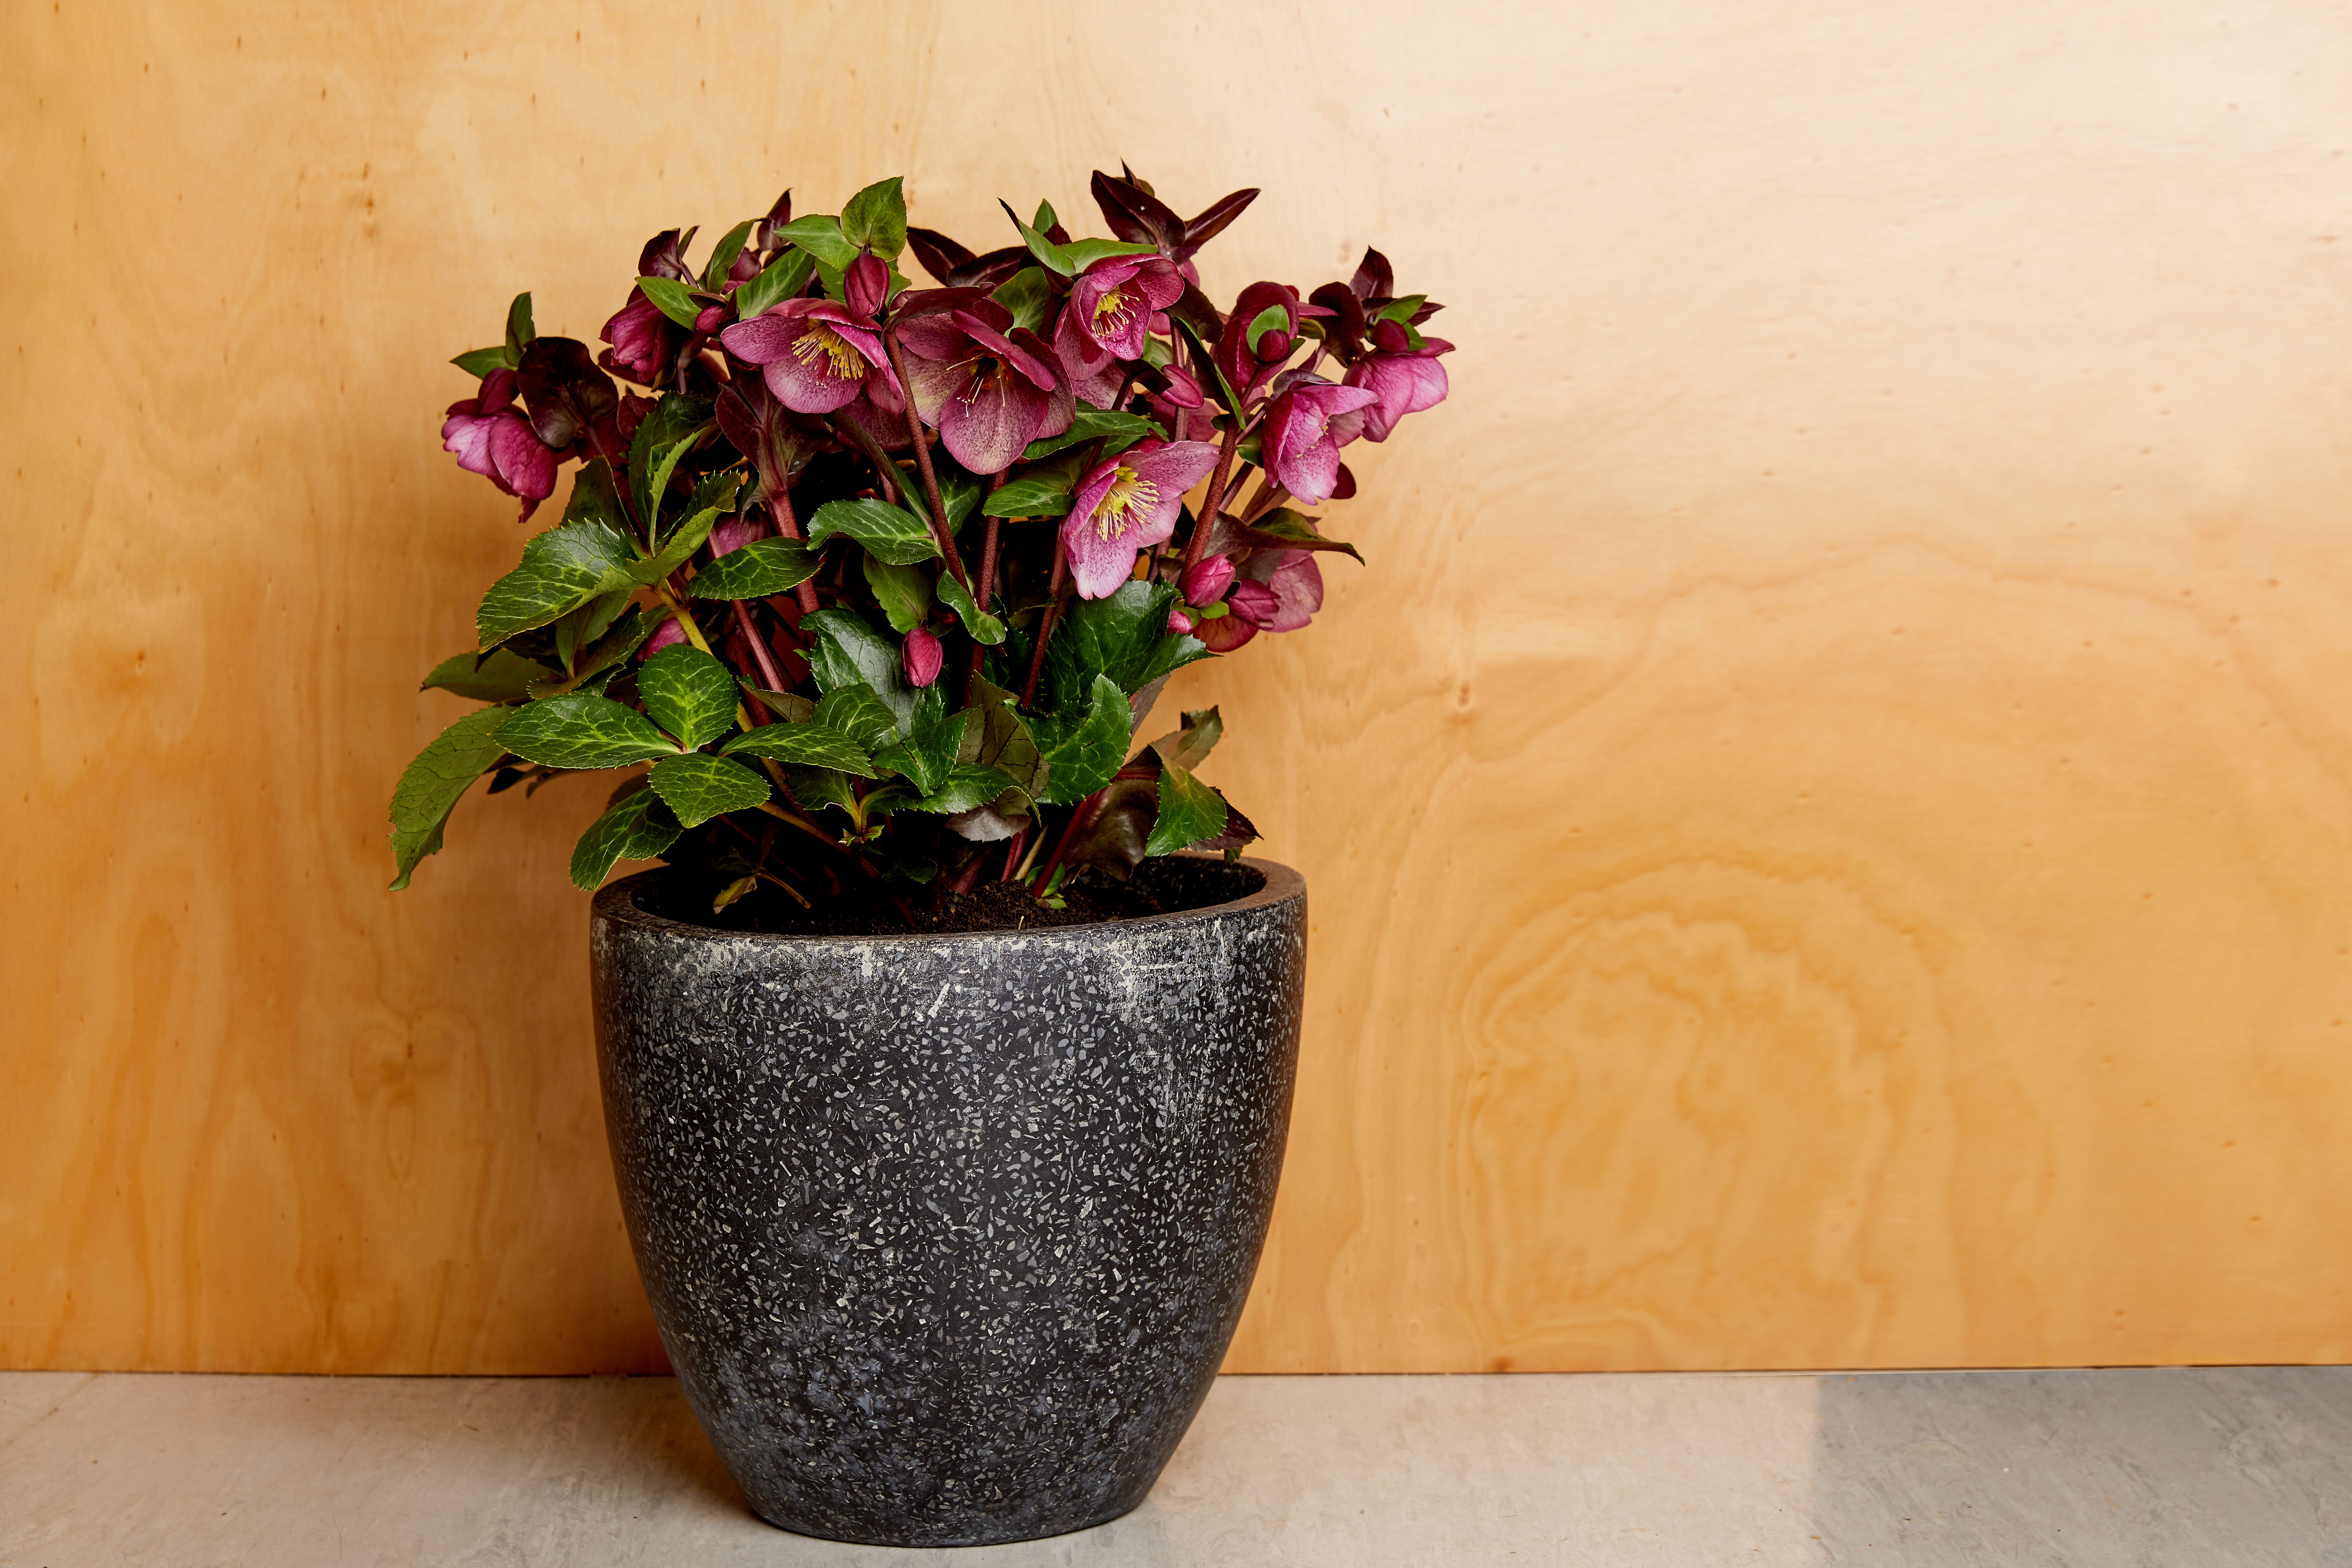 Website/Plants/2144399076/Images/Gallery/PMA_Helaboris_Plain_2.0.jpg